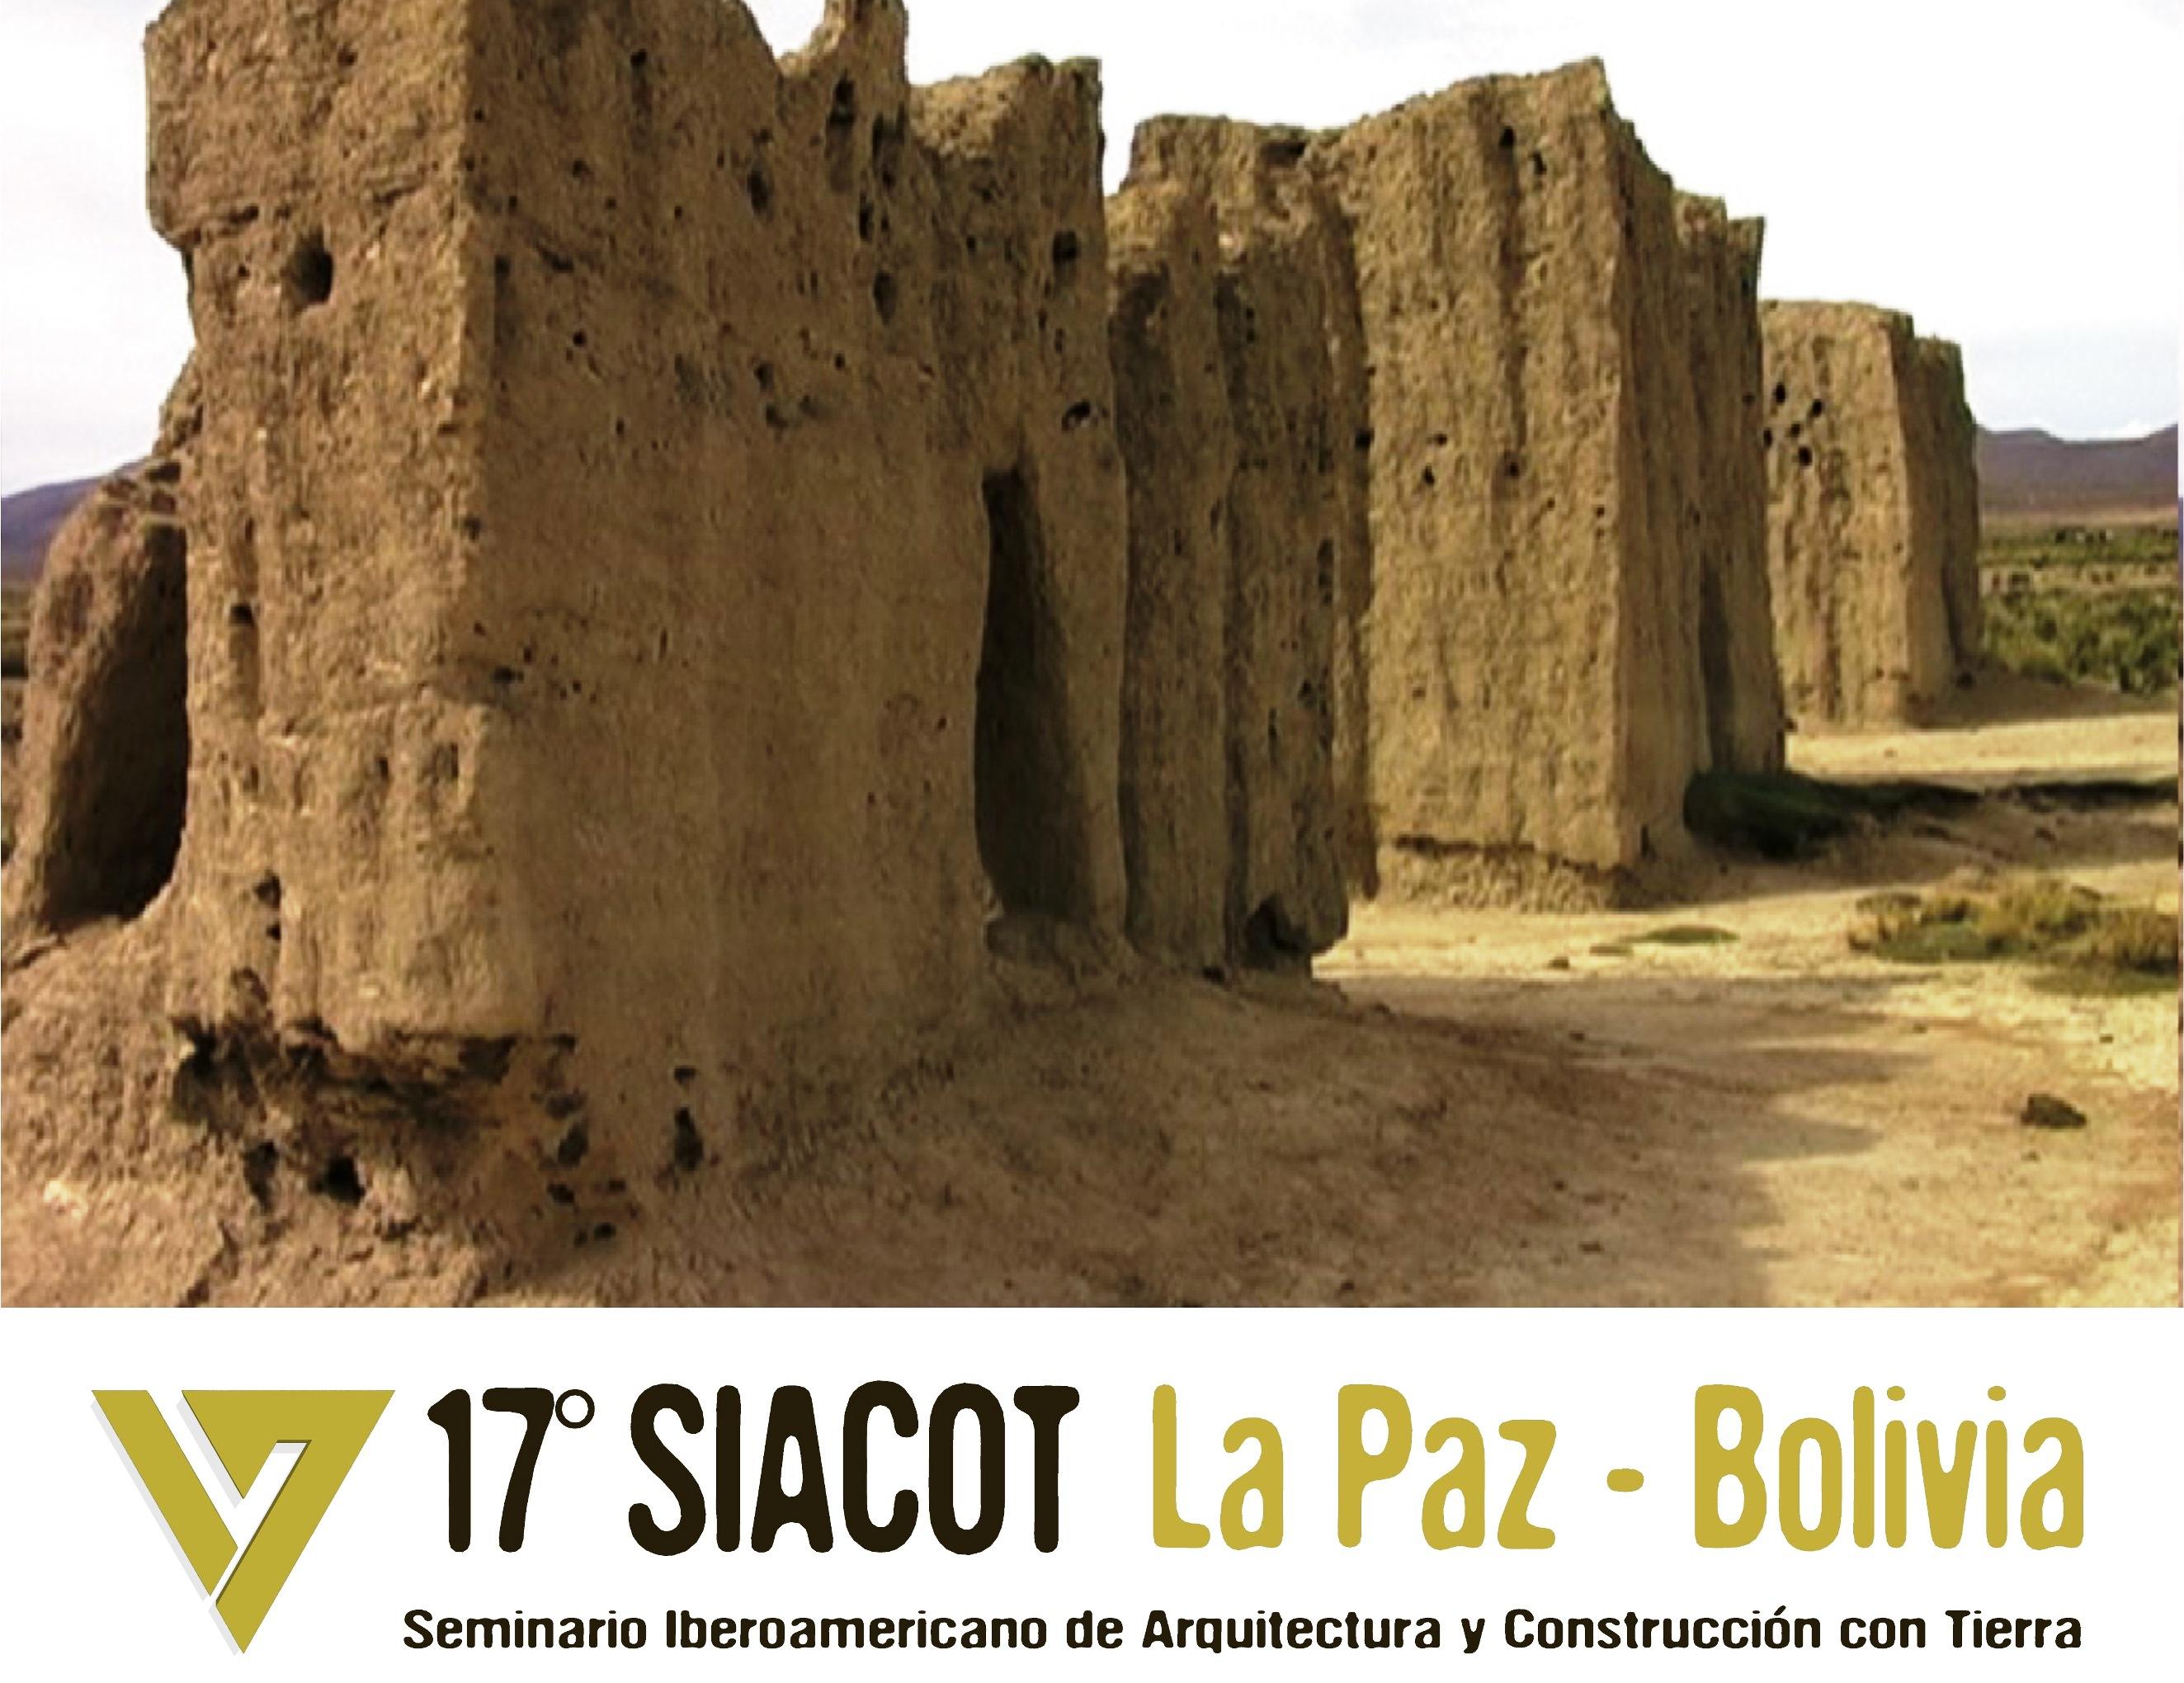 17° SIACOT – La Paz, Bolivia